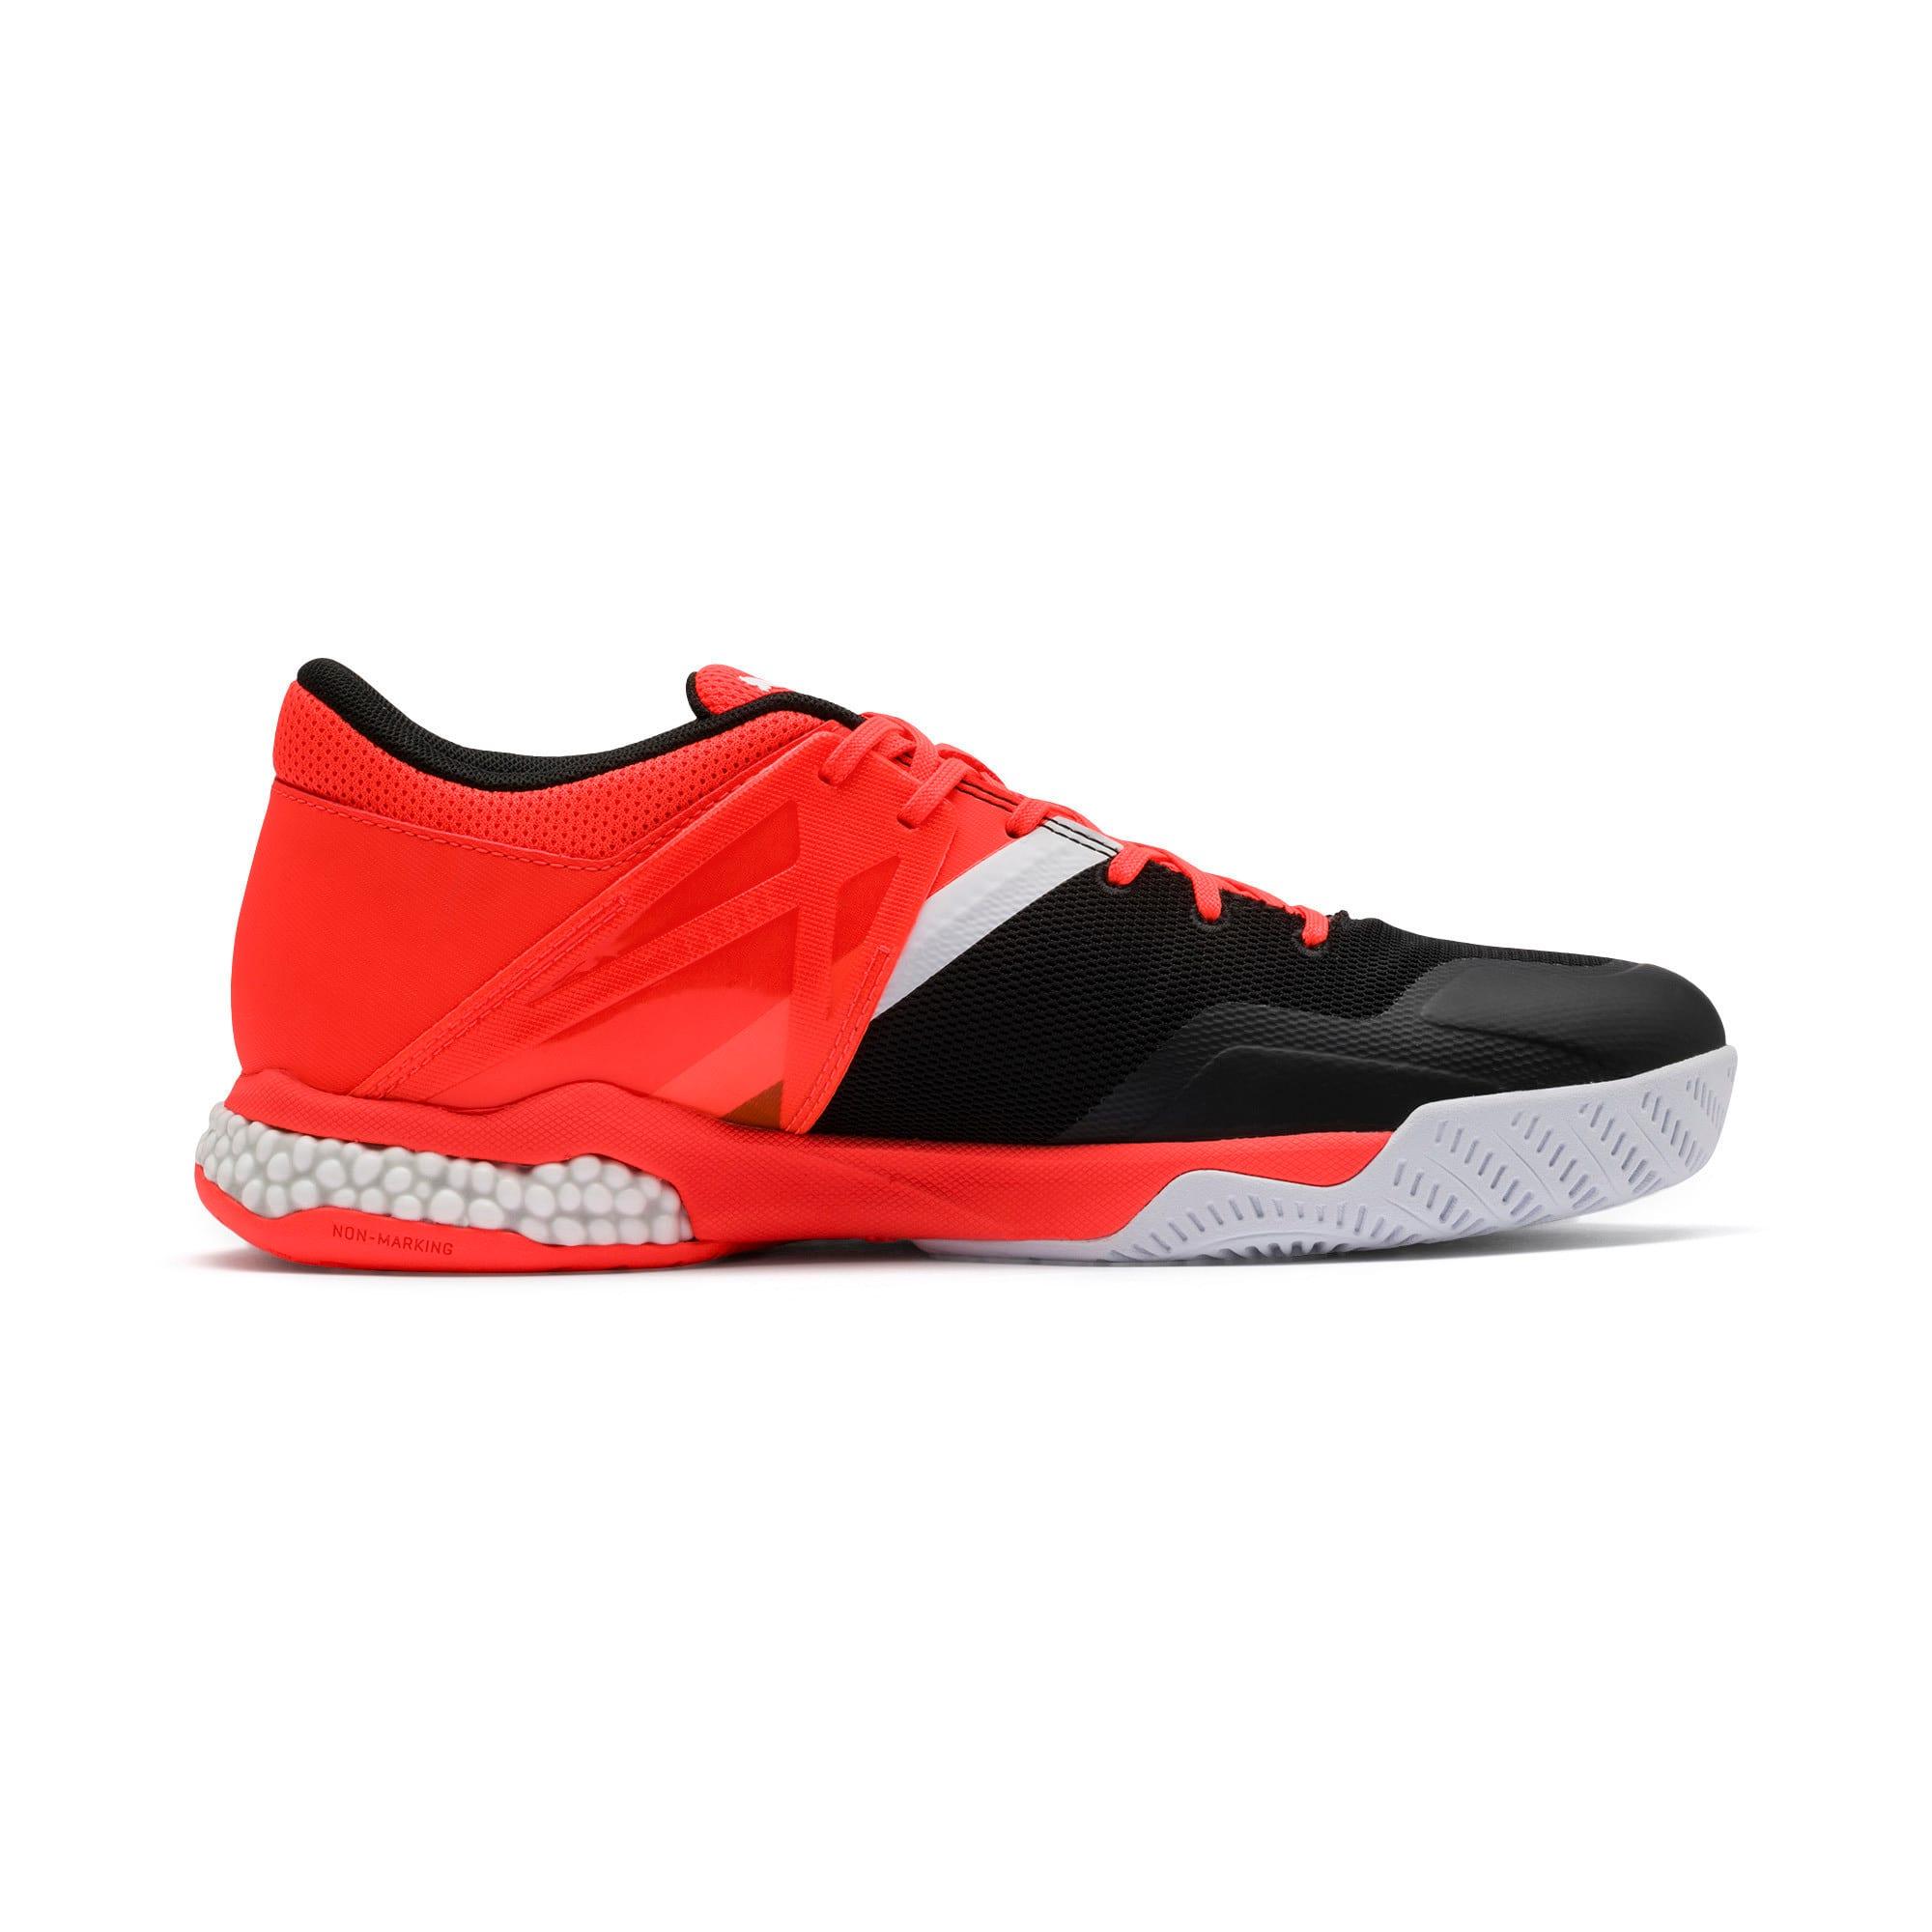 Thumbnail 6 of Chaussures Handball Explode XT Hybrid 2 Training, Black-Puma White-Nrgy Red, medium